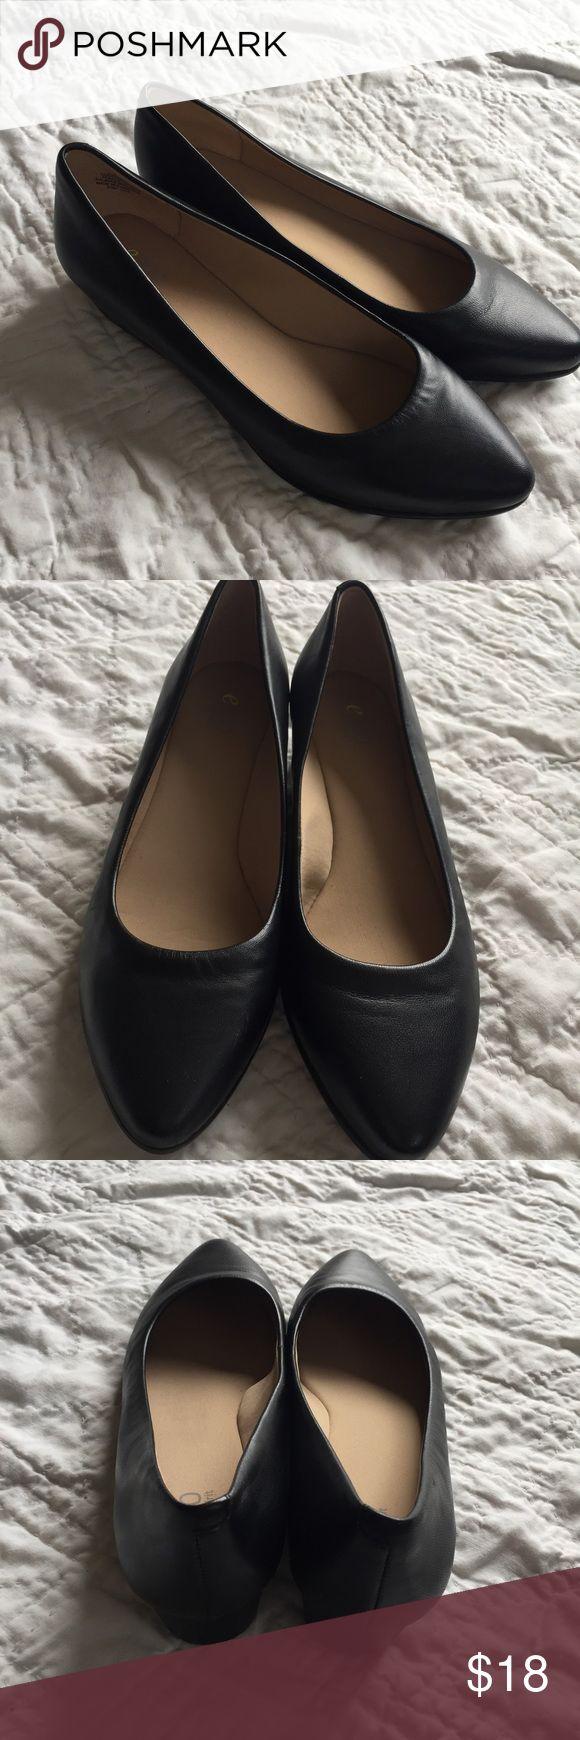 Easy Spirit e360 Avery Women US 8.5 Black Low heel Easy Spirit e360 Avery Women US 8.5 Black Low Wedge Heel Slip-on Comfort Shoe Easy Spirit Shoes Flats & Loafers